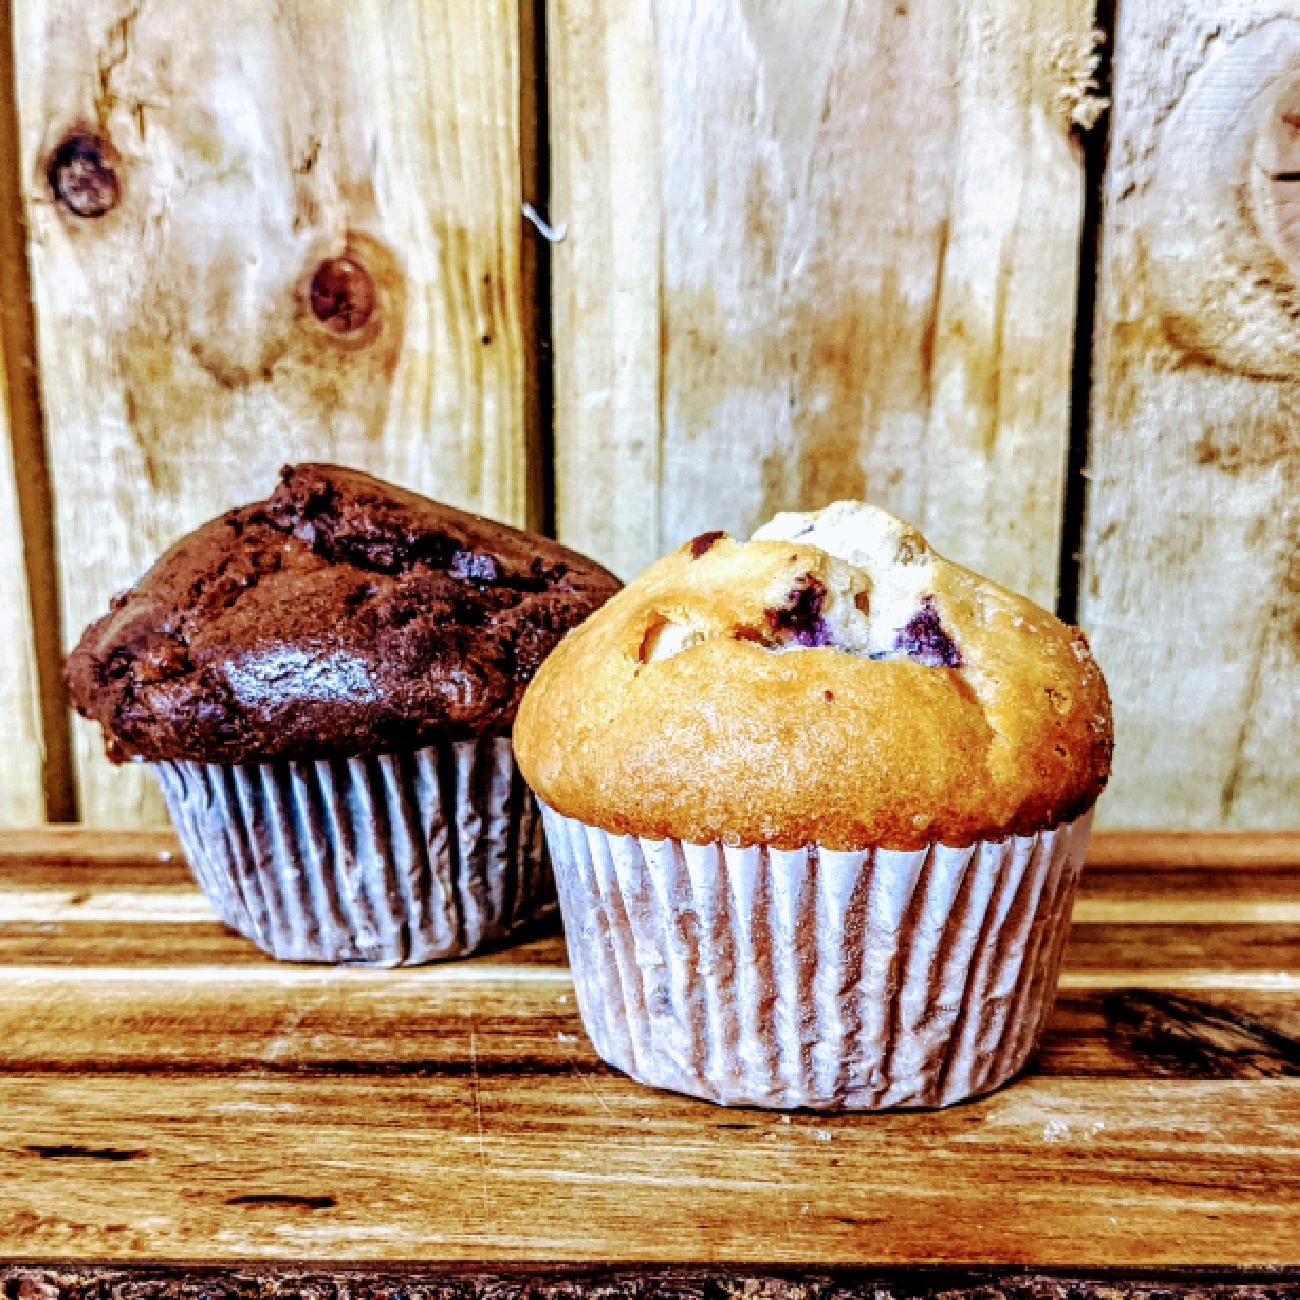 Bluberry Muffin